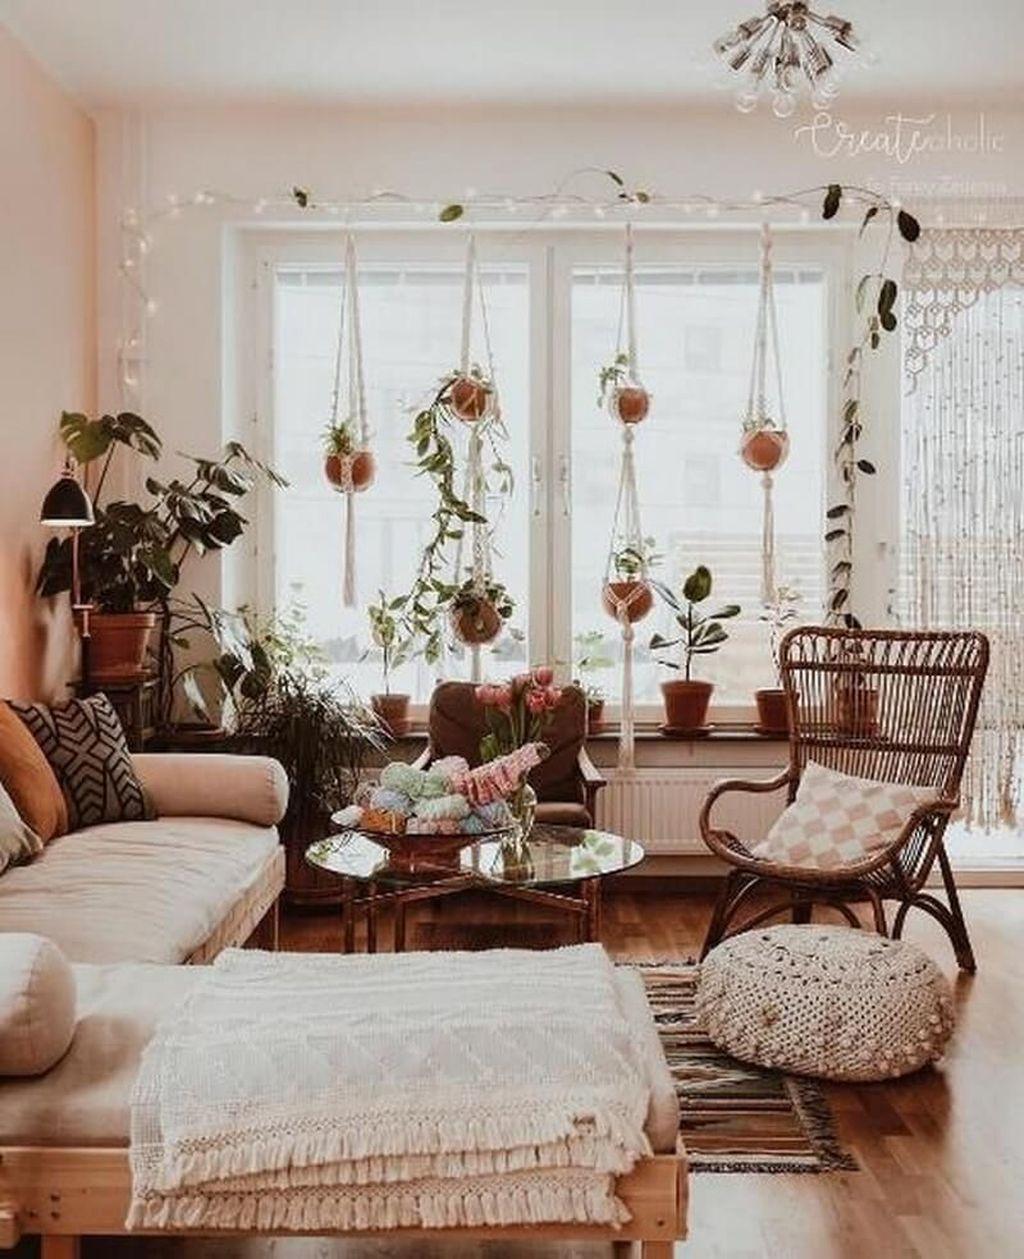 Lovely Boho Chic Apartment Decor Ideas Decor Design Decor Chic Home Decor